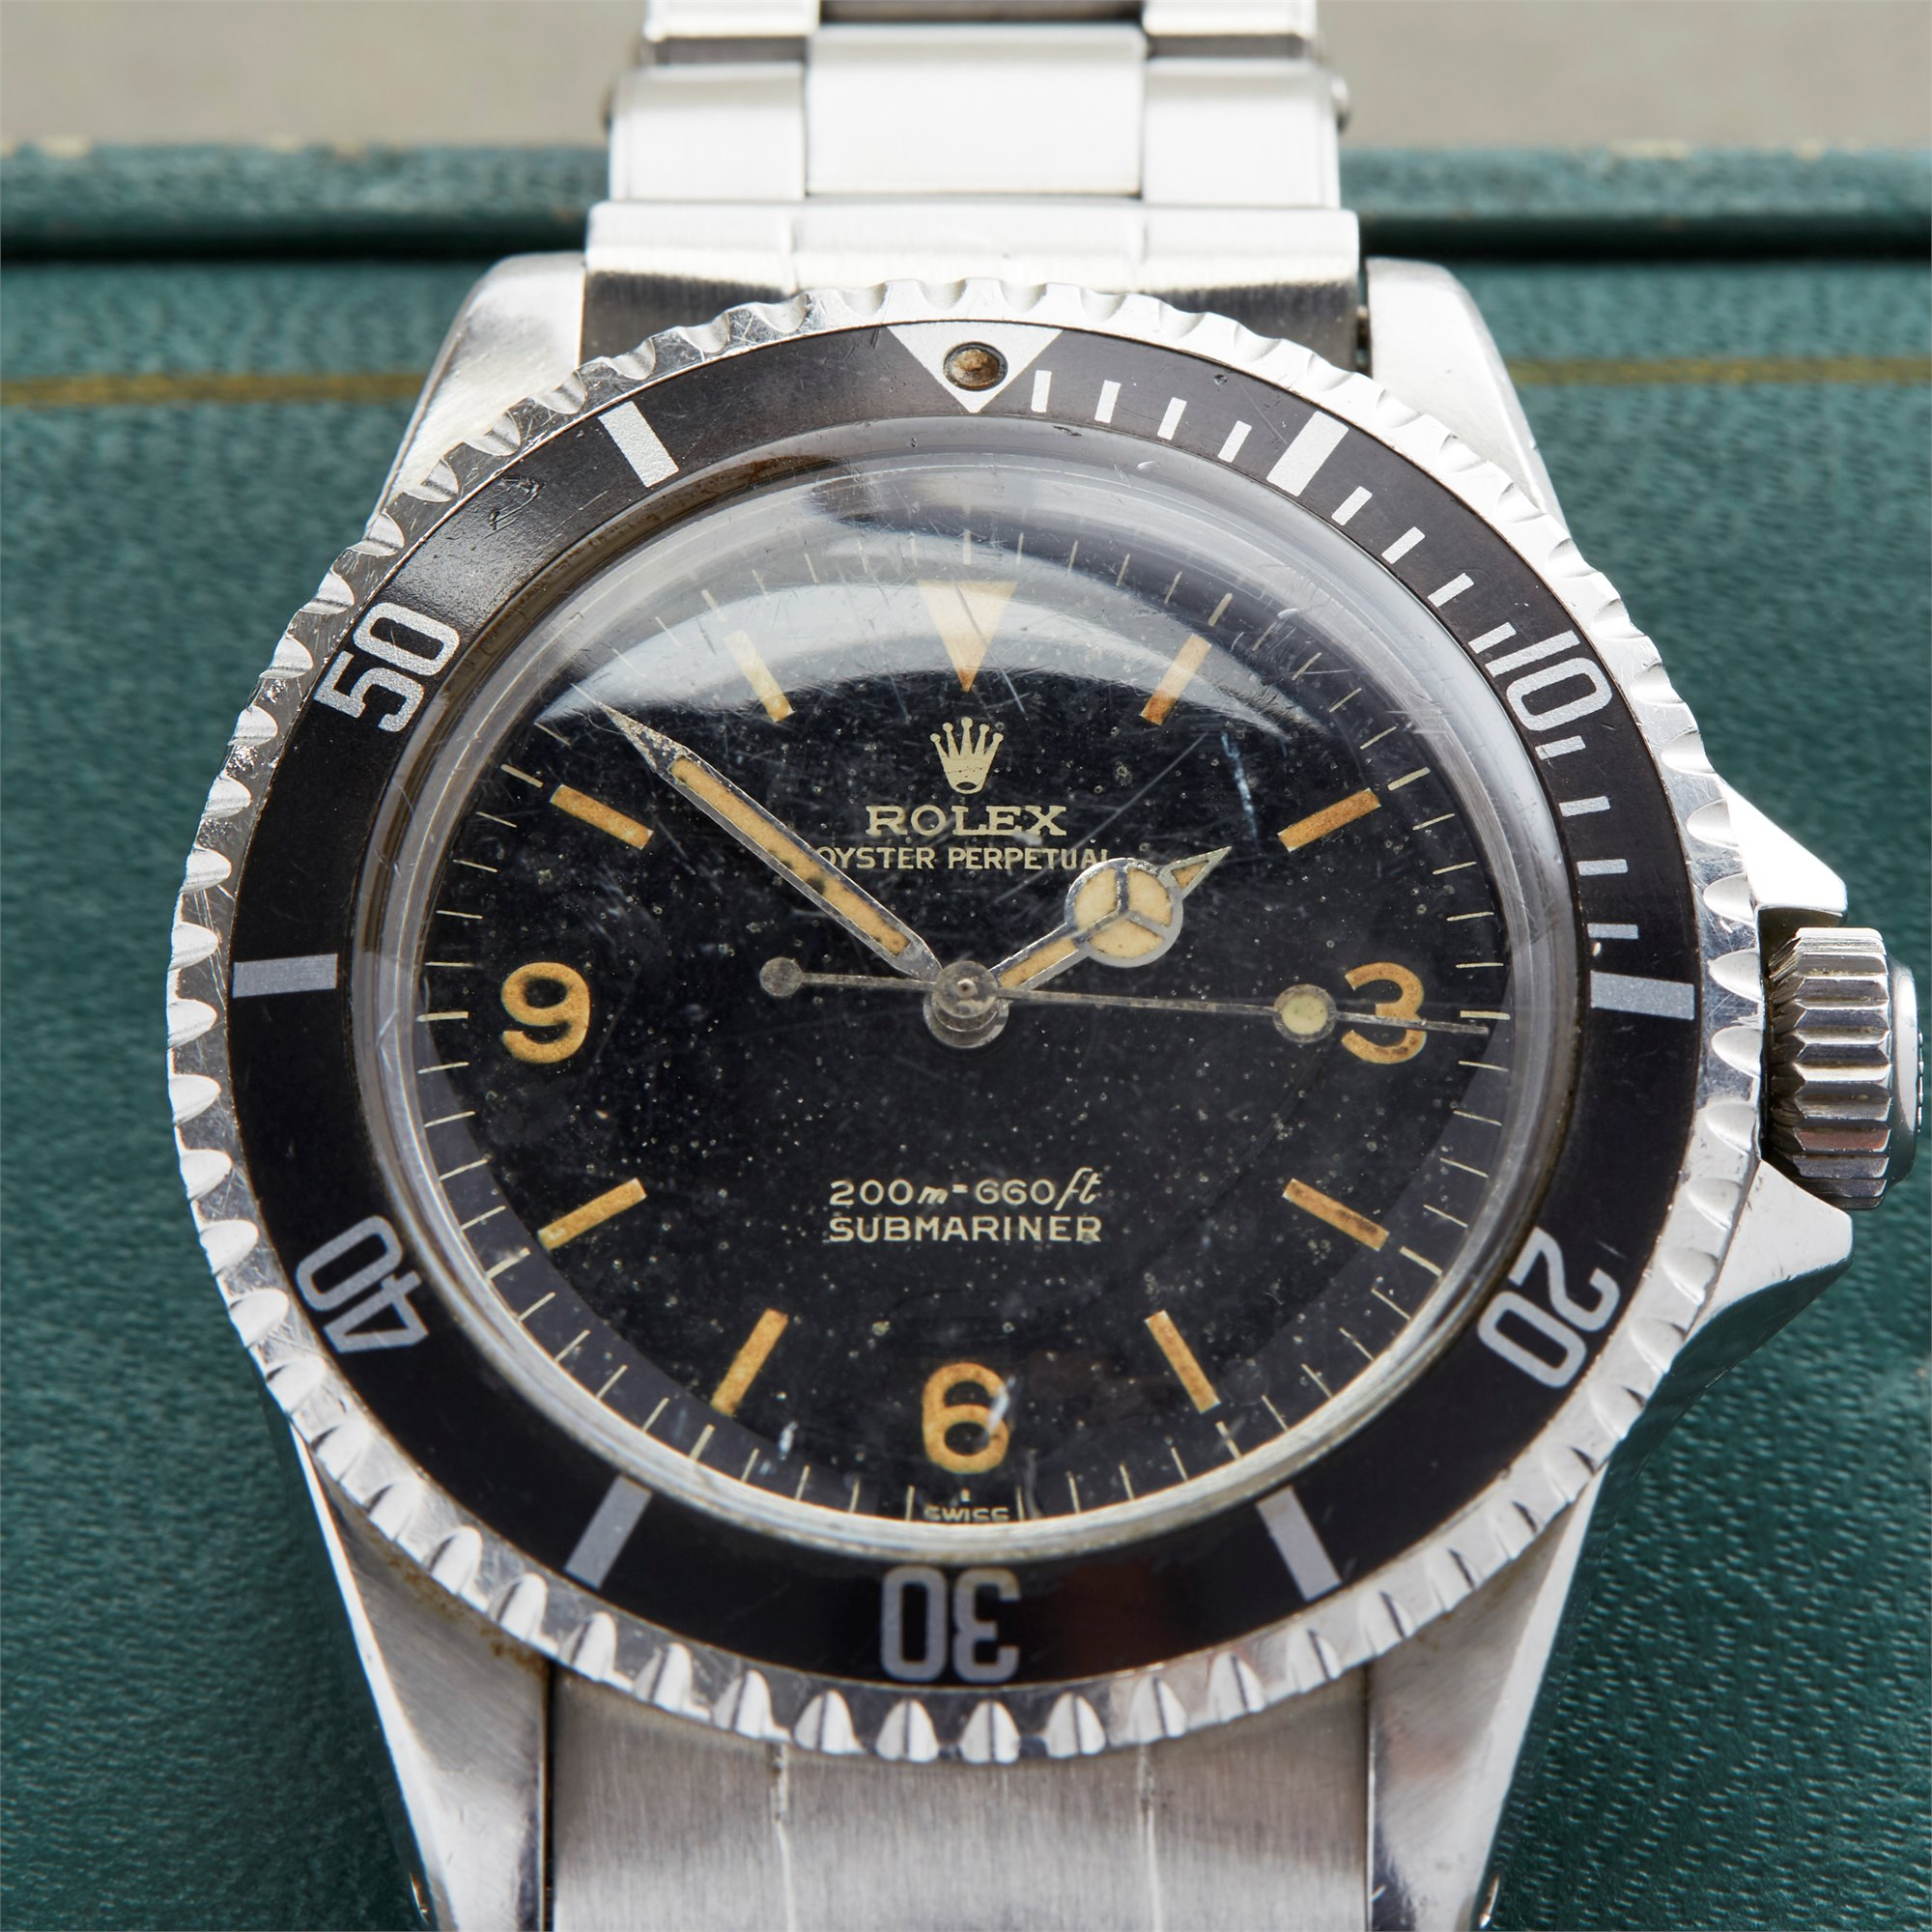 "Rolex Submariner Gilt Explorer ""Kissing L"" Dial Stainless Steel - 5513 Stainless Steel 5513"